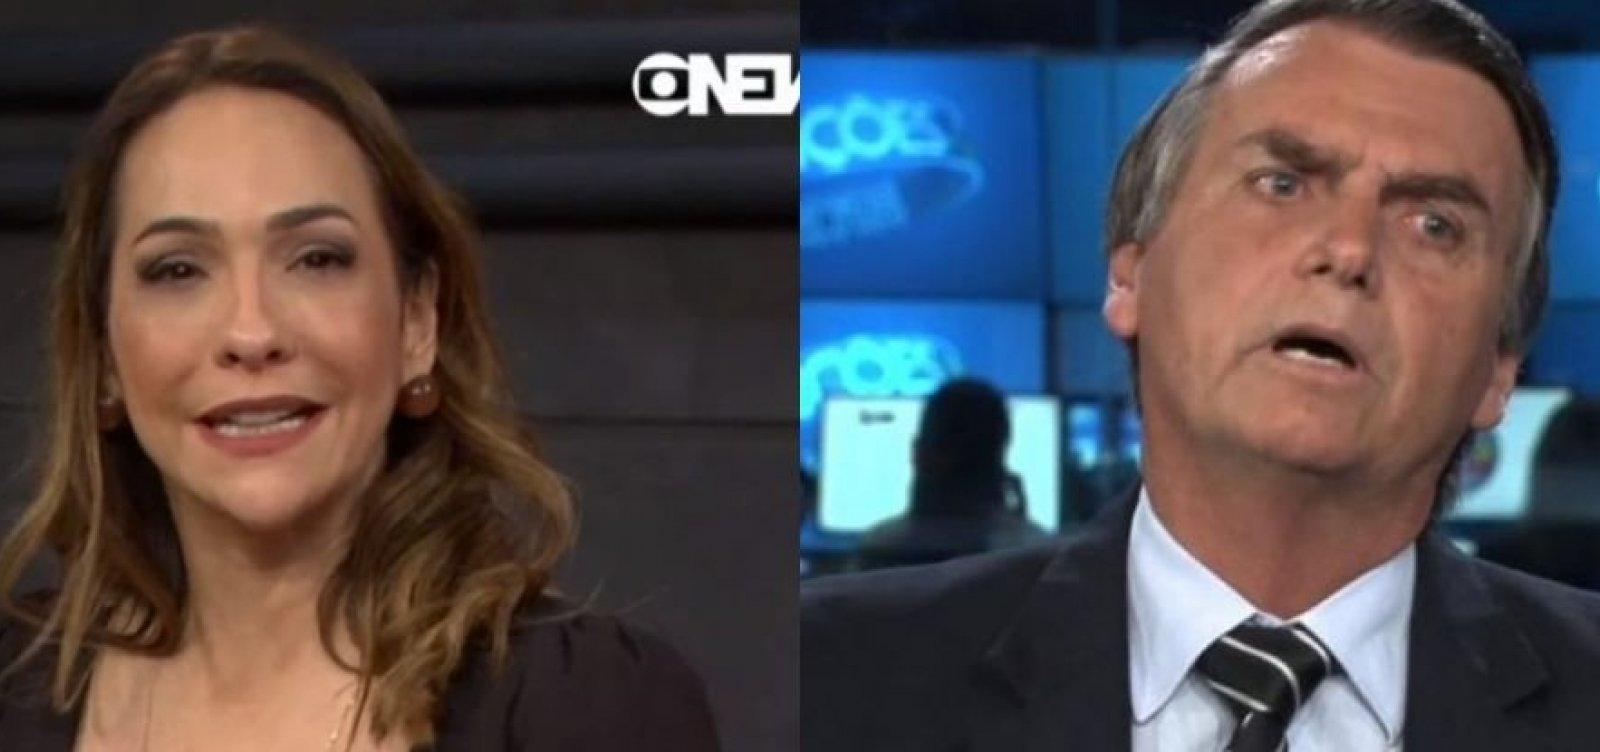 [Apresentadora da Globo News chama presidente de 'Bozonaro' ao vivo; Veja!]